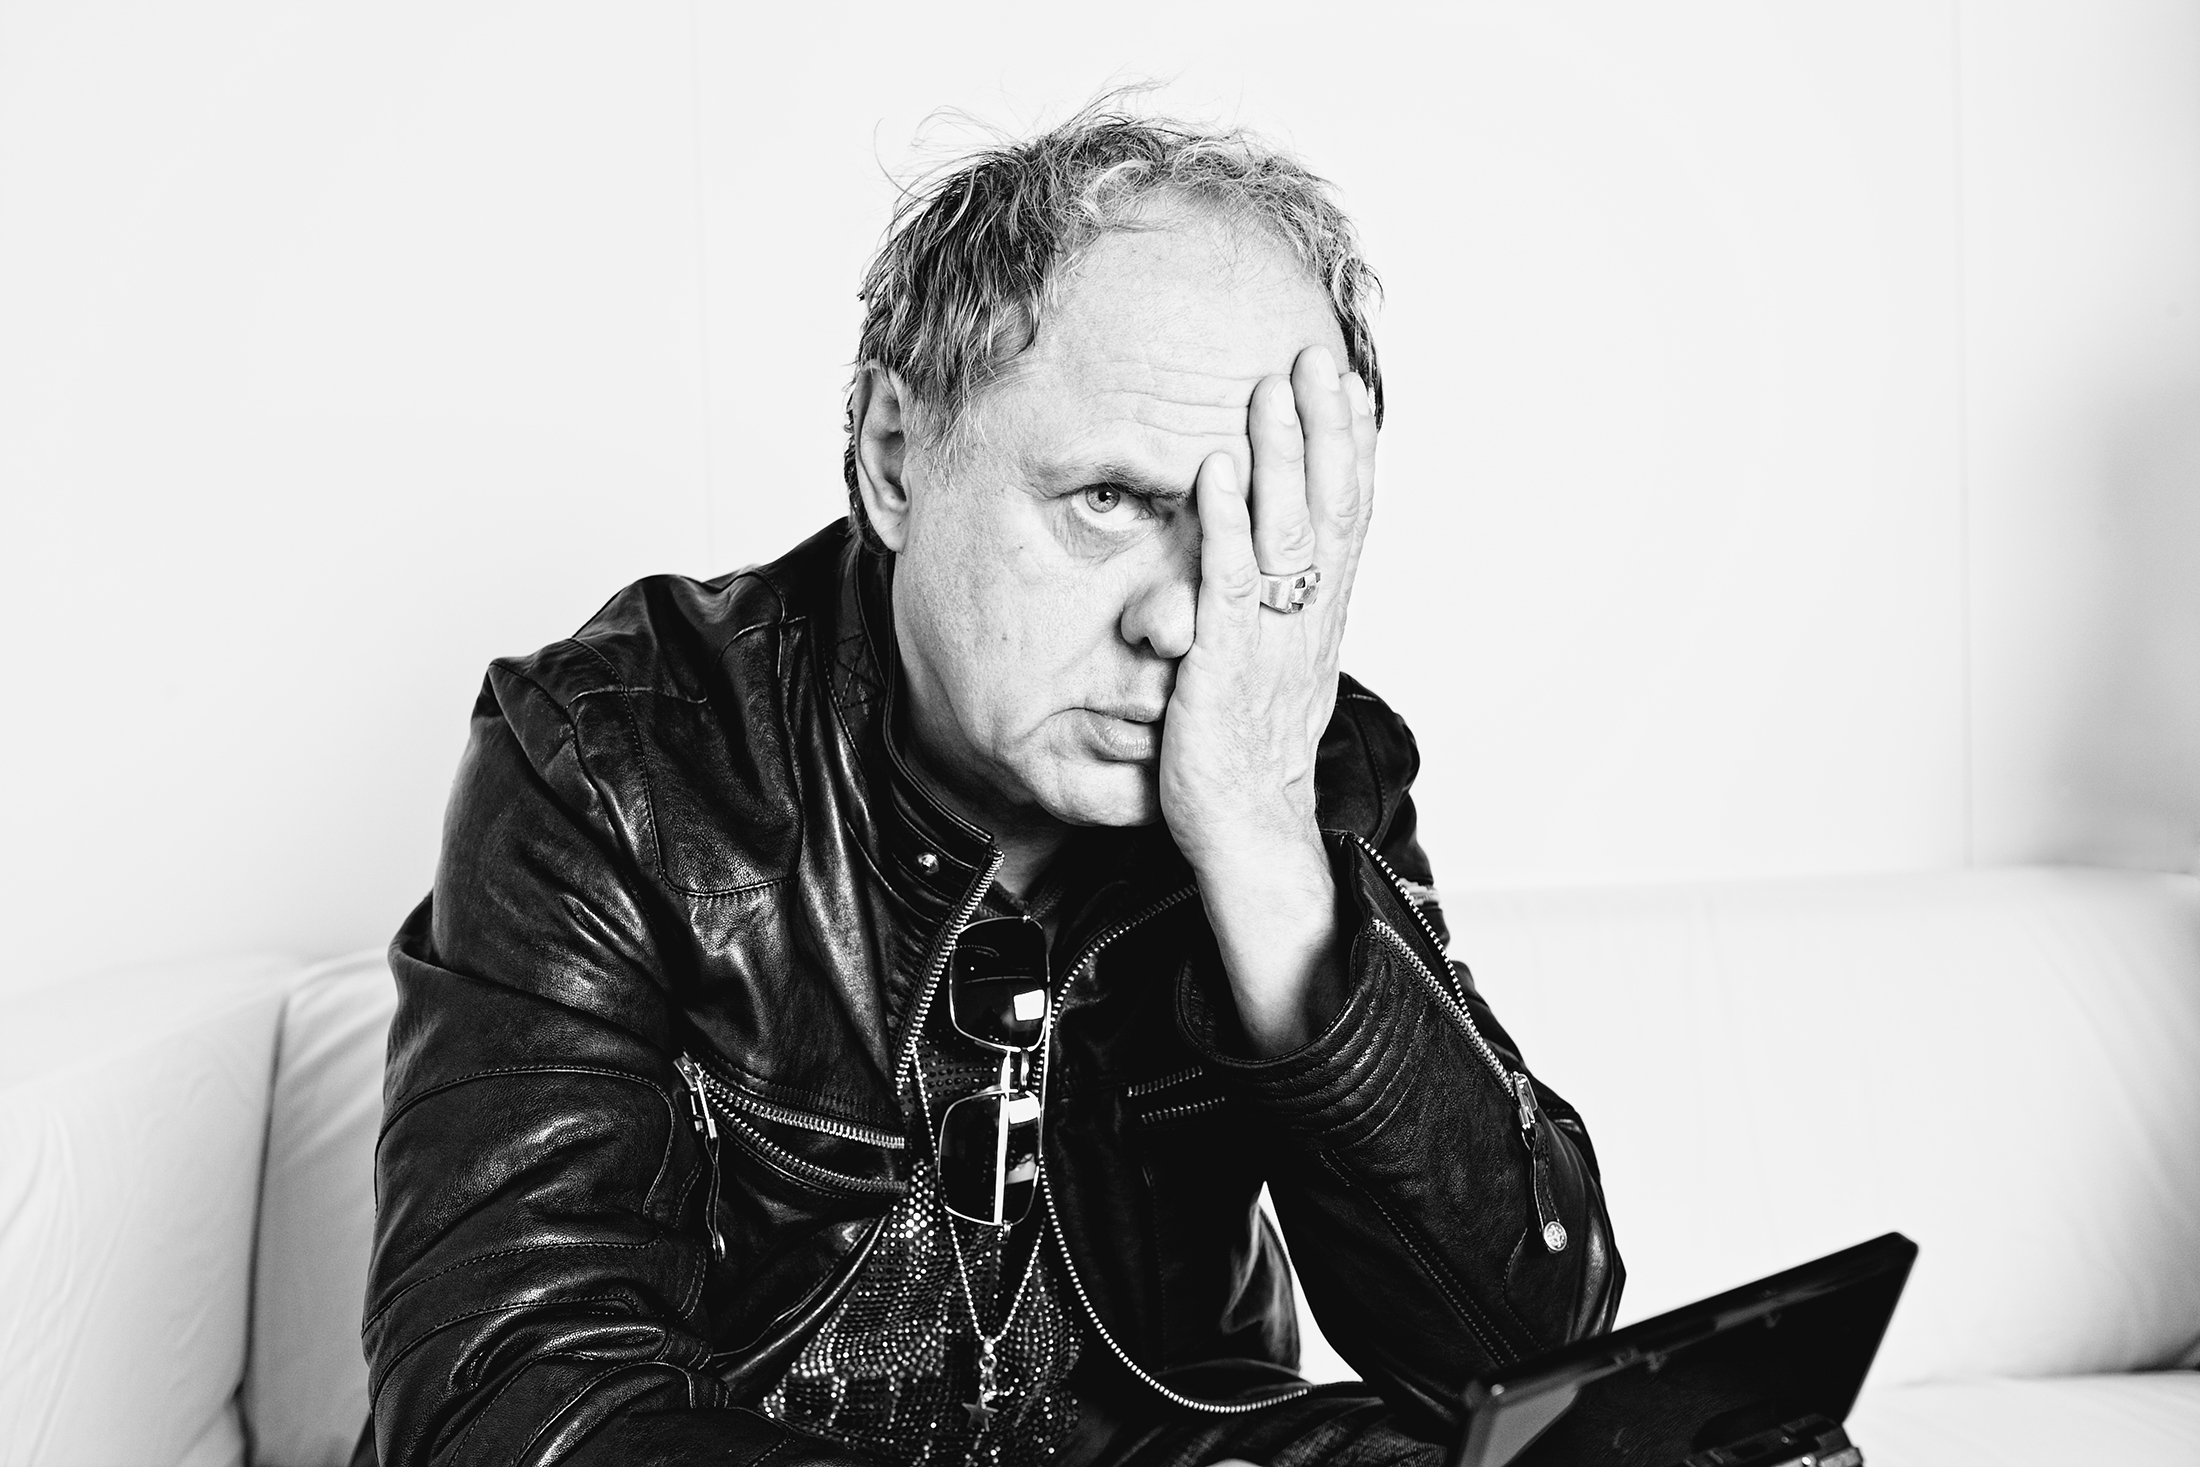 Uwe Ochsenknecht, Schauspieler, Florian Kresse, Fotograf, Peoplefotografie, Portrait